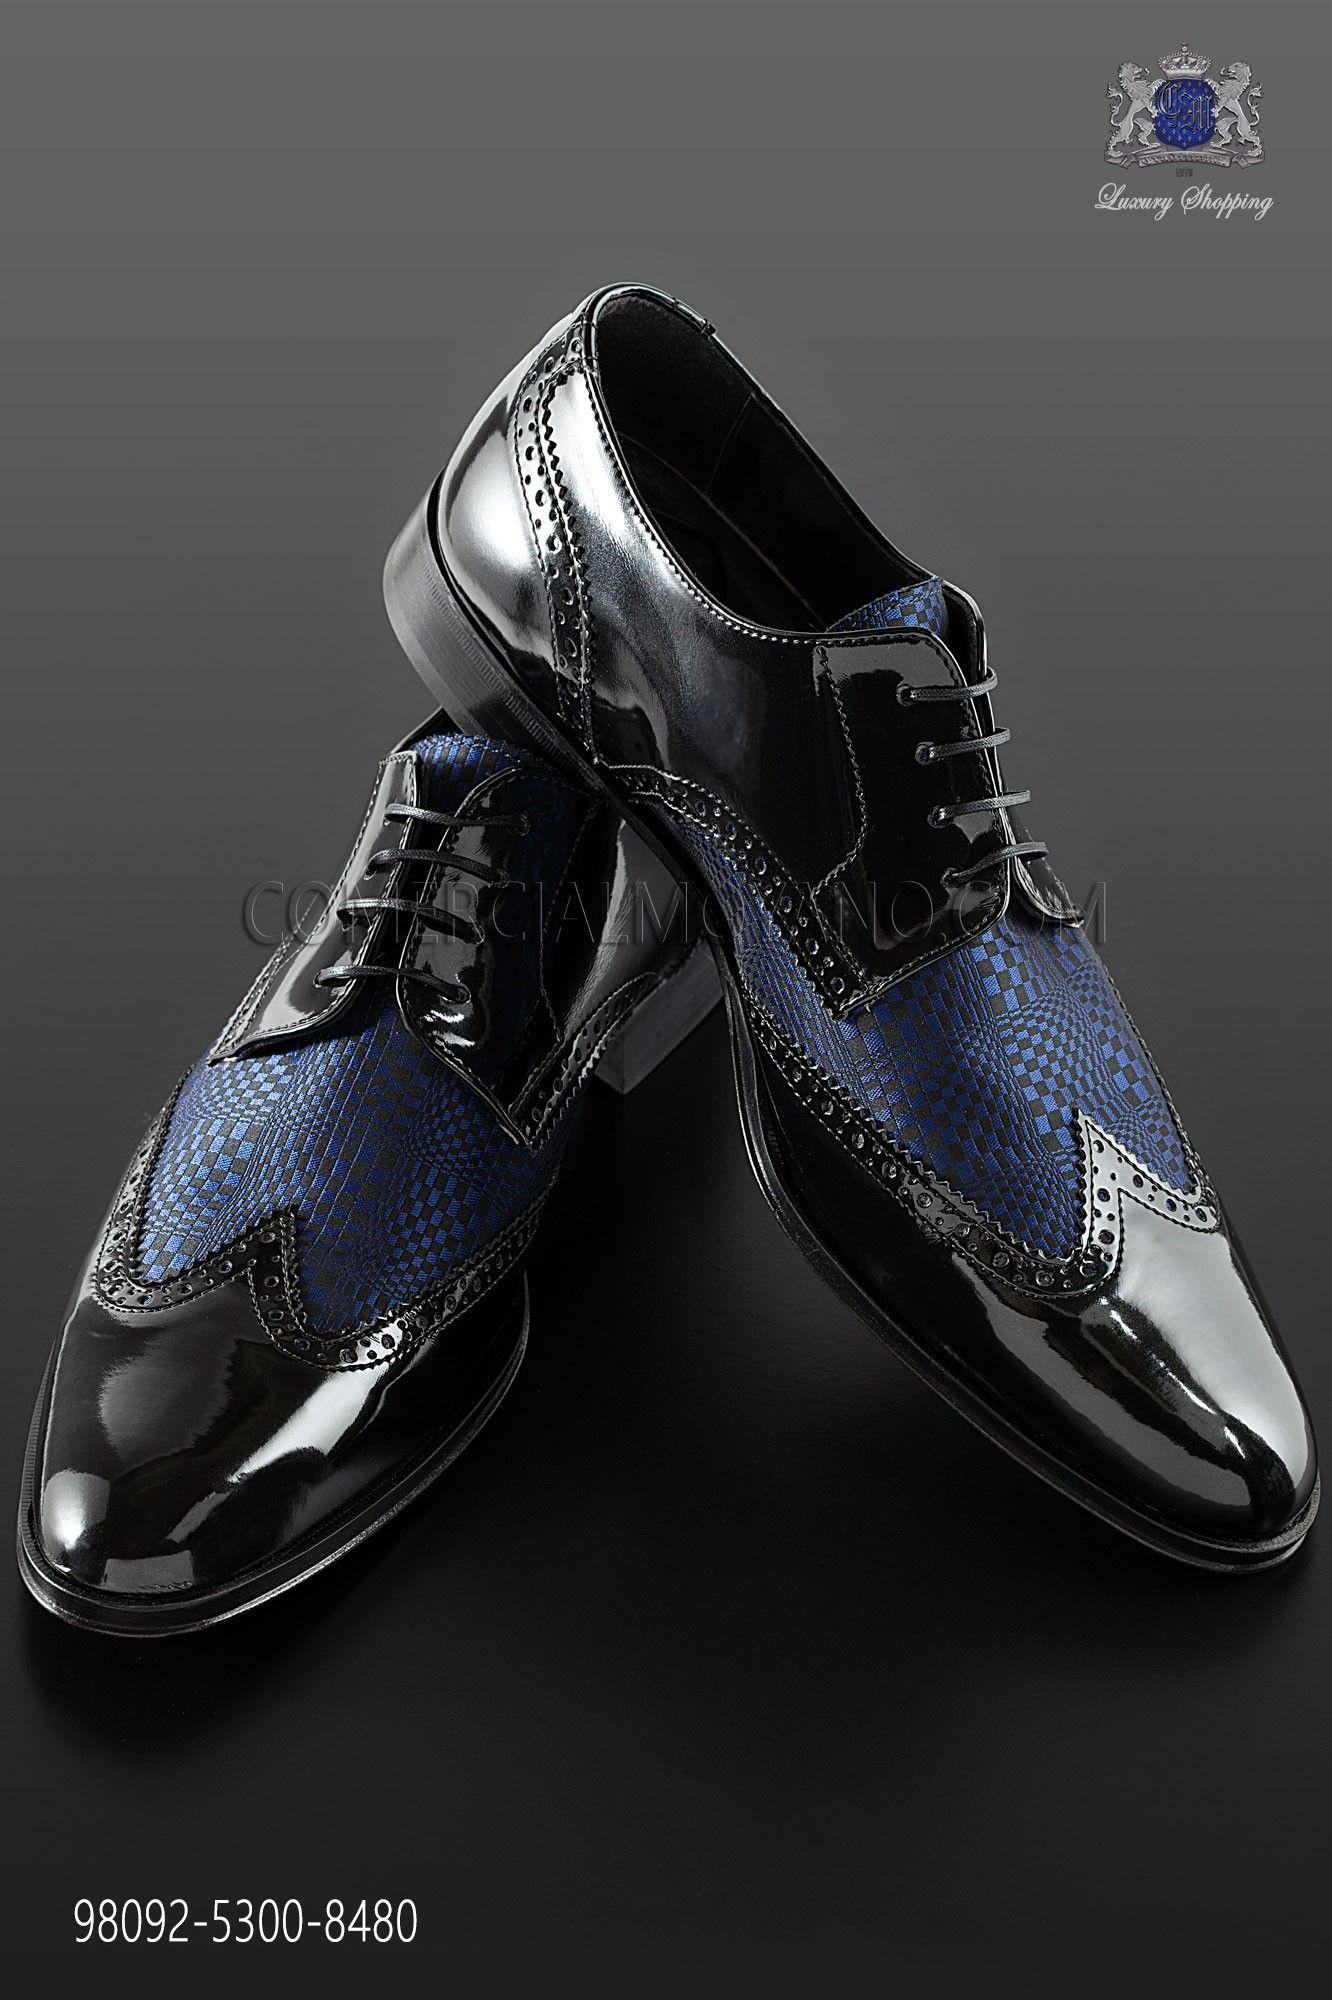 Blue Jacquard Combined With Black Leather Francesina Shoes Style Gents Shoes Leather Shoe Laces Dress Shoes Men [ 2000 x 1332 Pixel ]